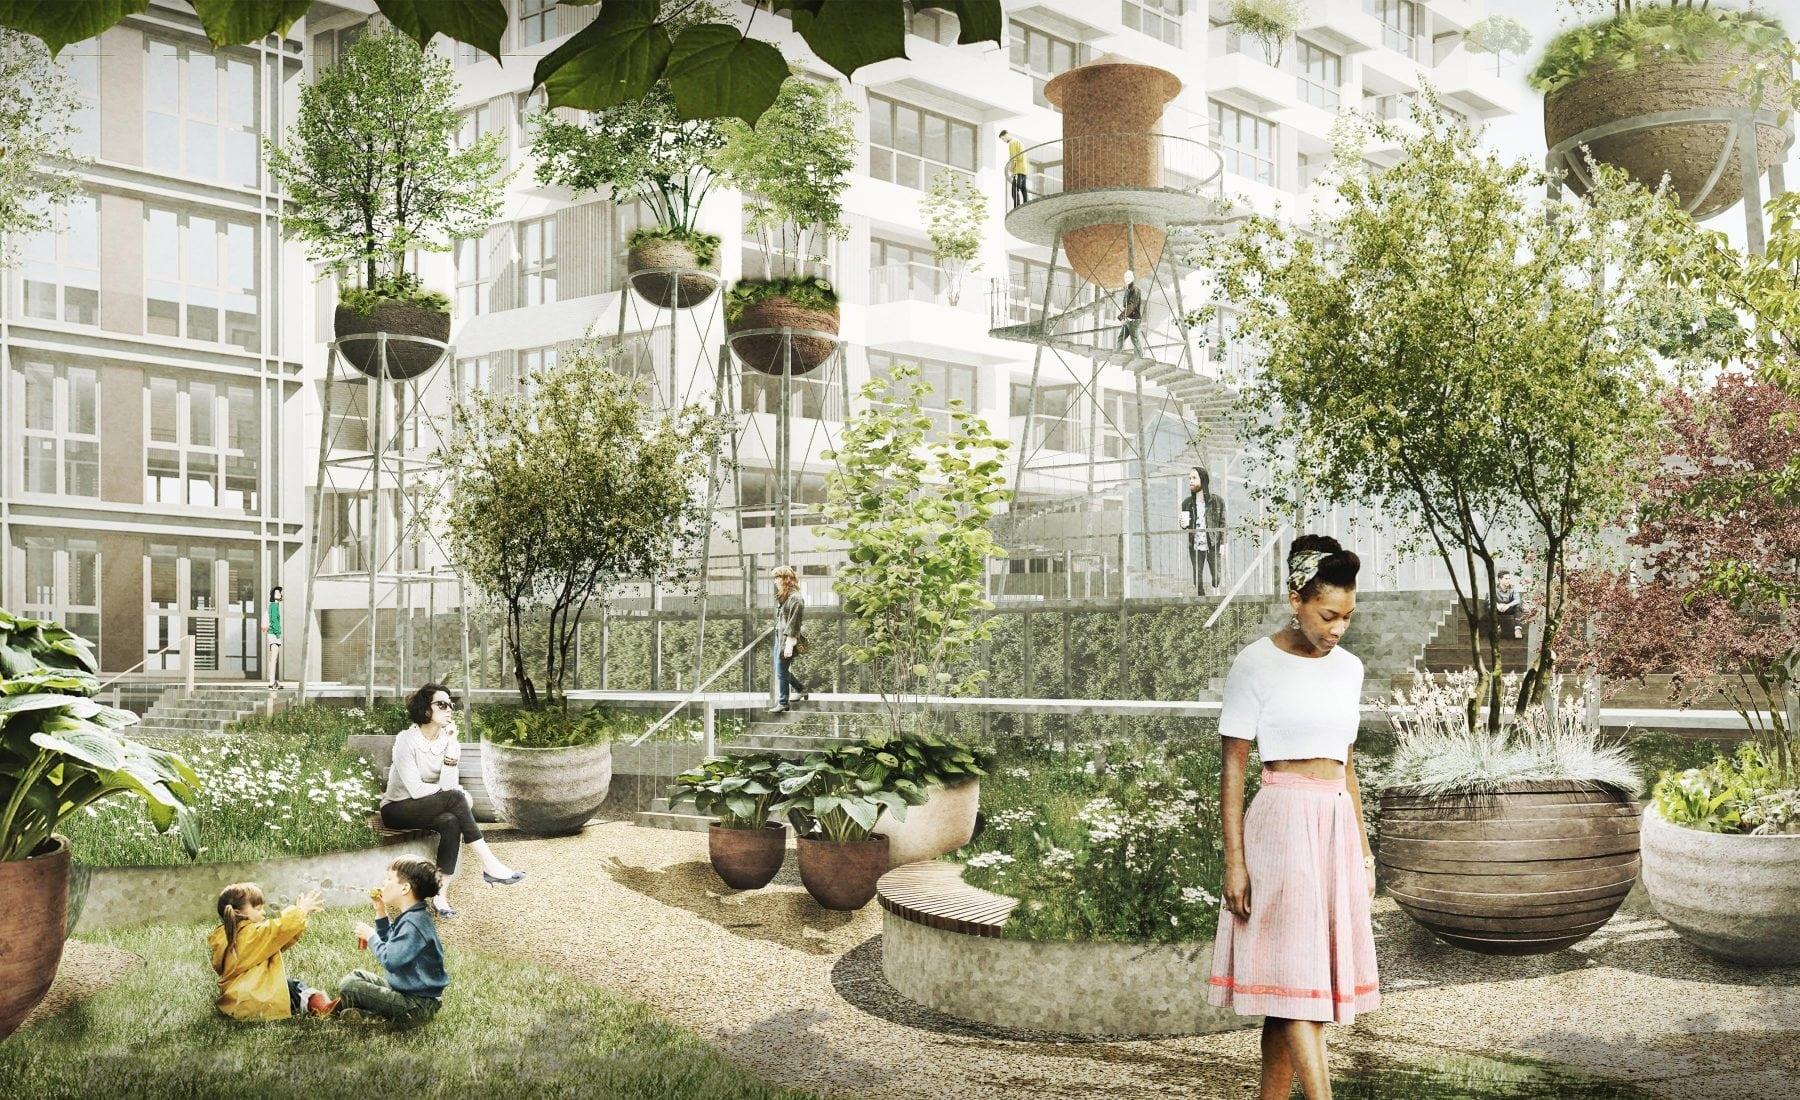 Delva landscape architecture & urbanism